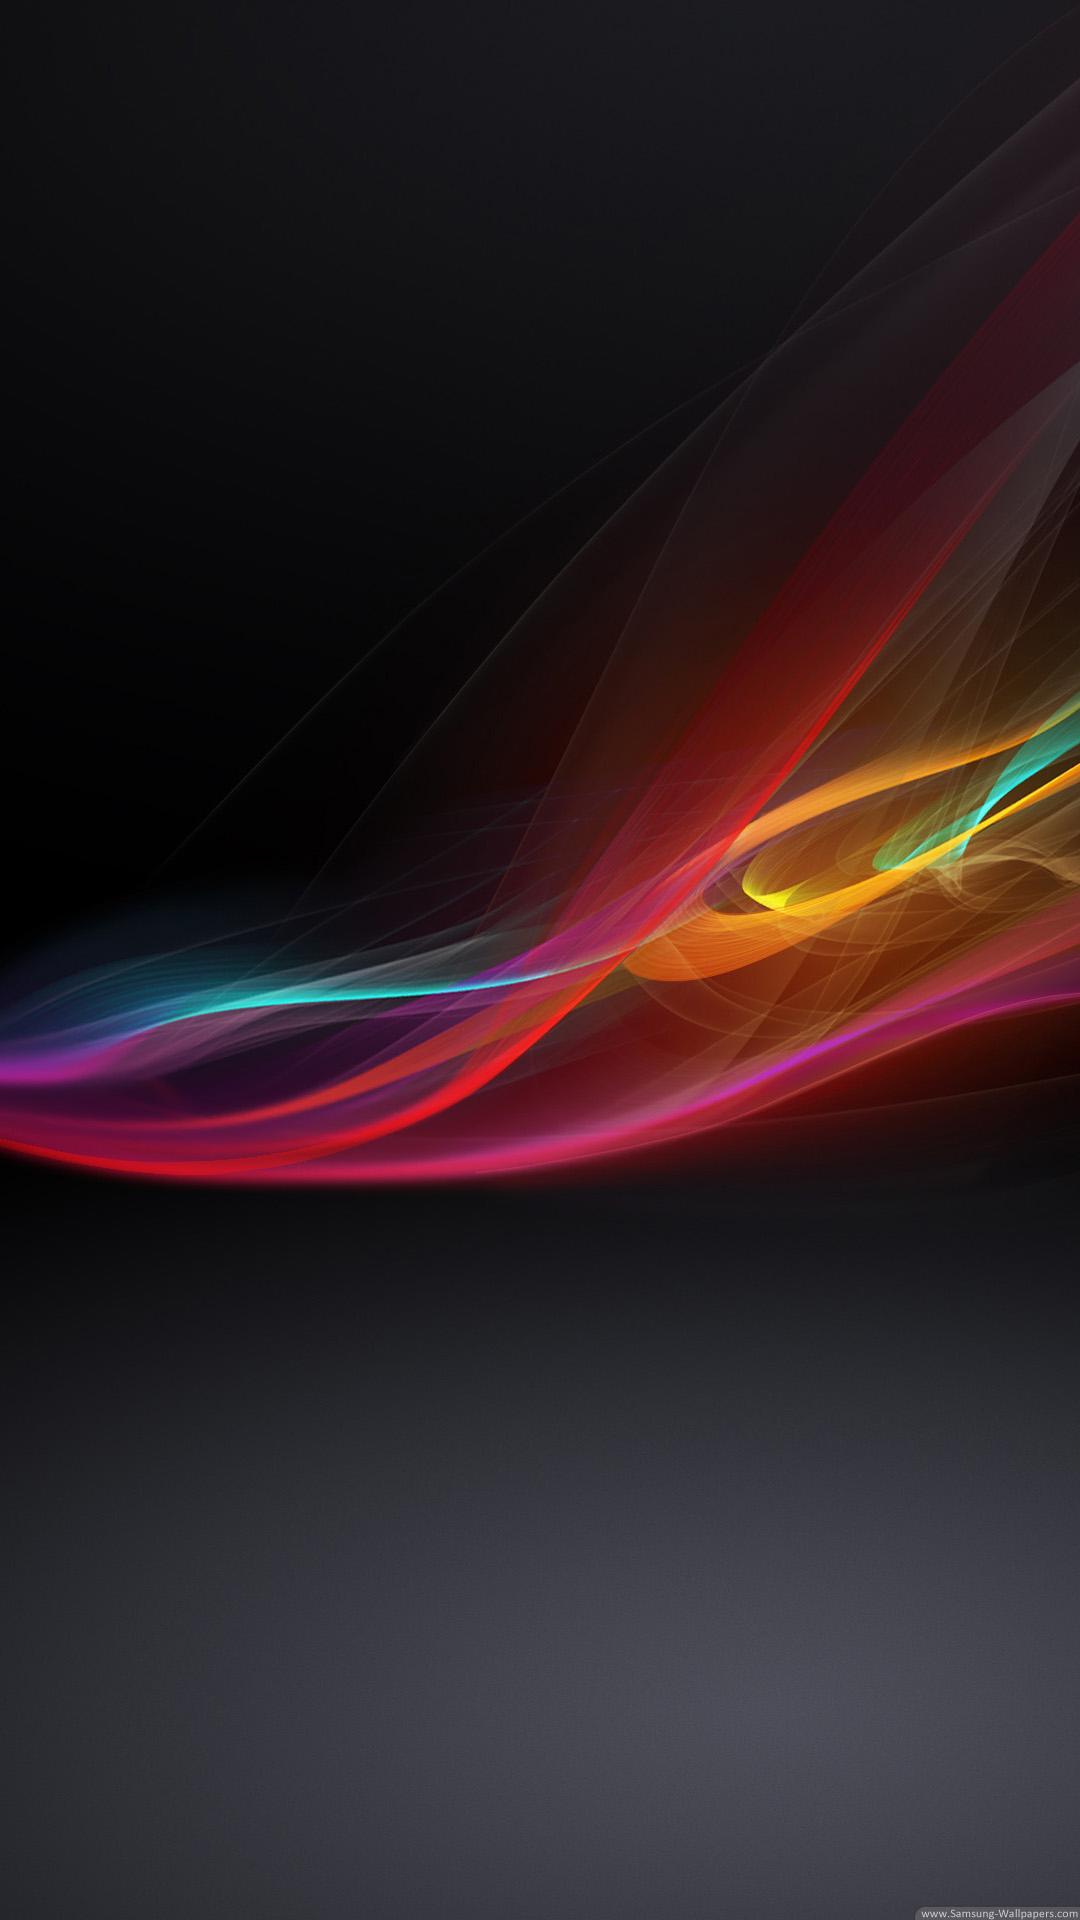 HD Wallpaper For Mobile Inc 1080x1920 1920x1080 720x1280 480x800 1080x1920